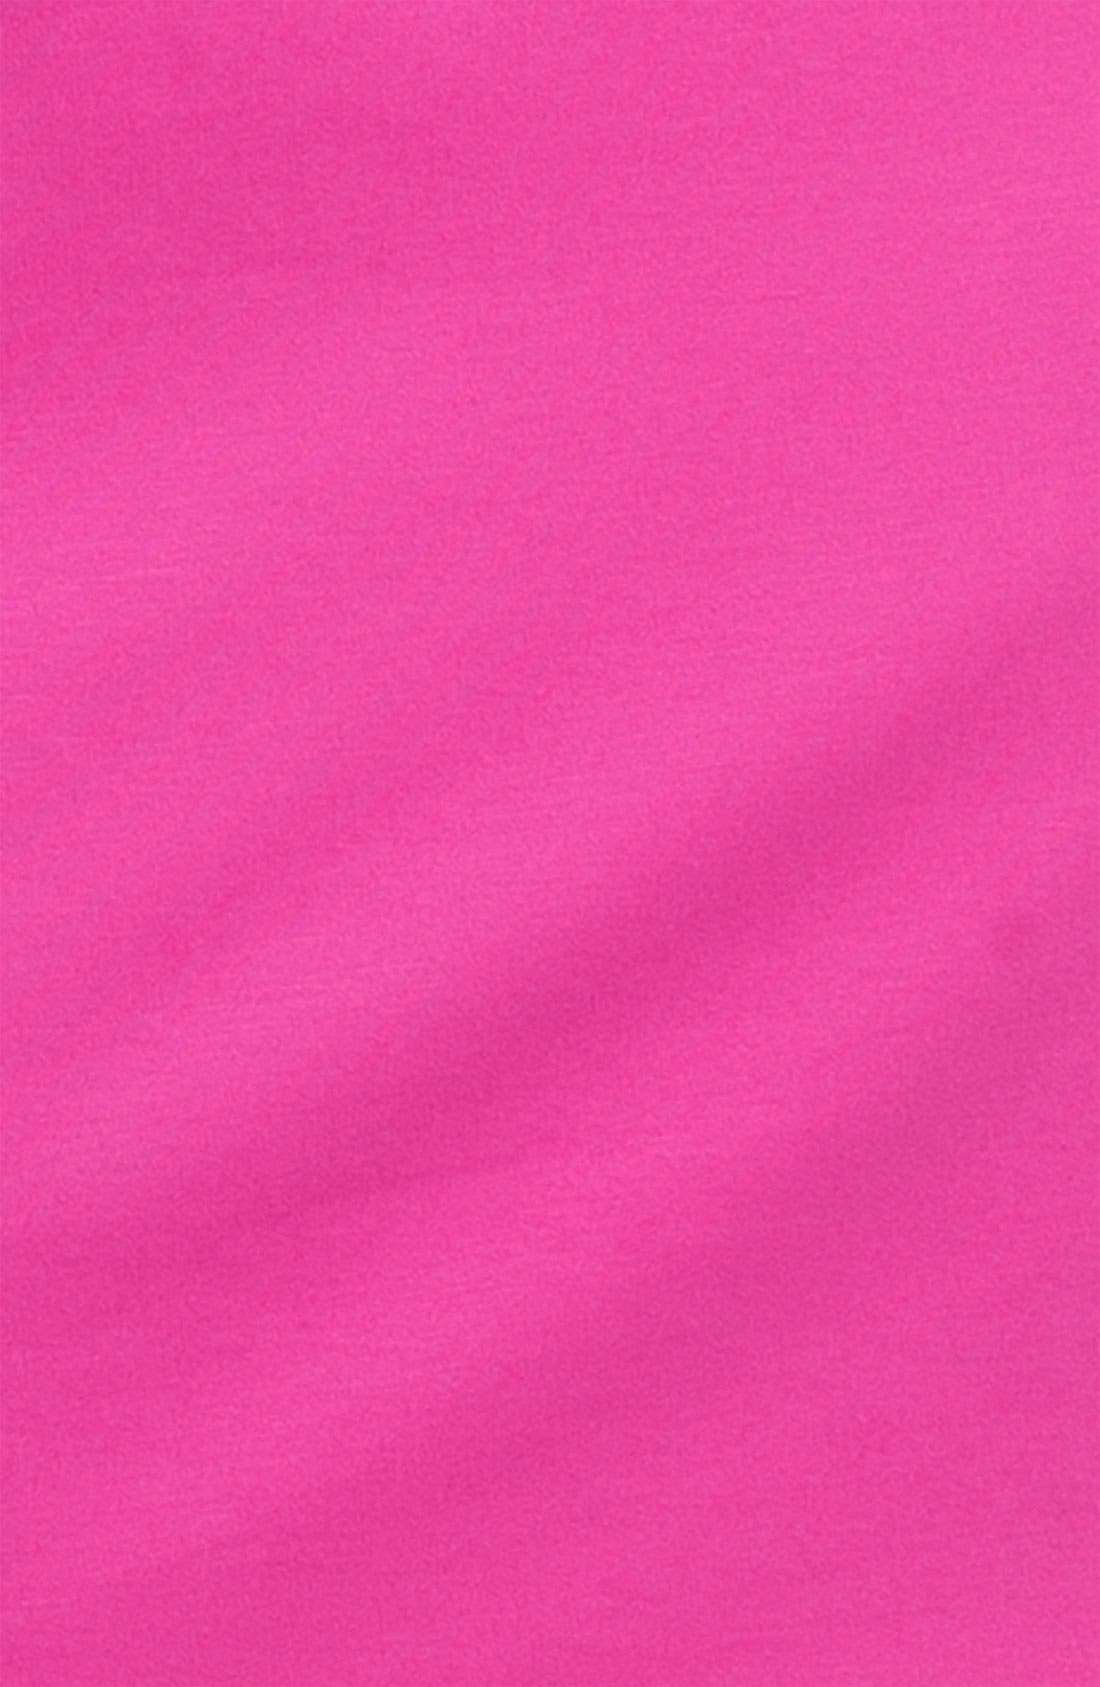 Alternate Image 3  - Trina Turk 'Robyn' Stretch Sheath Dress